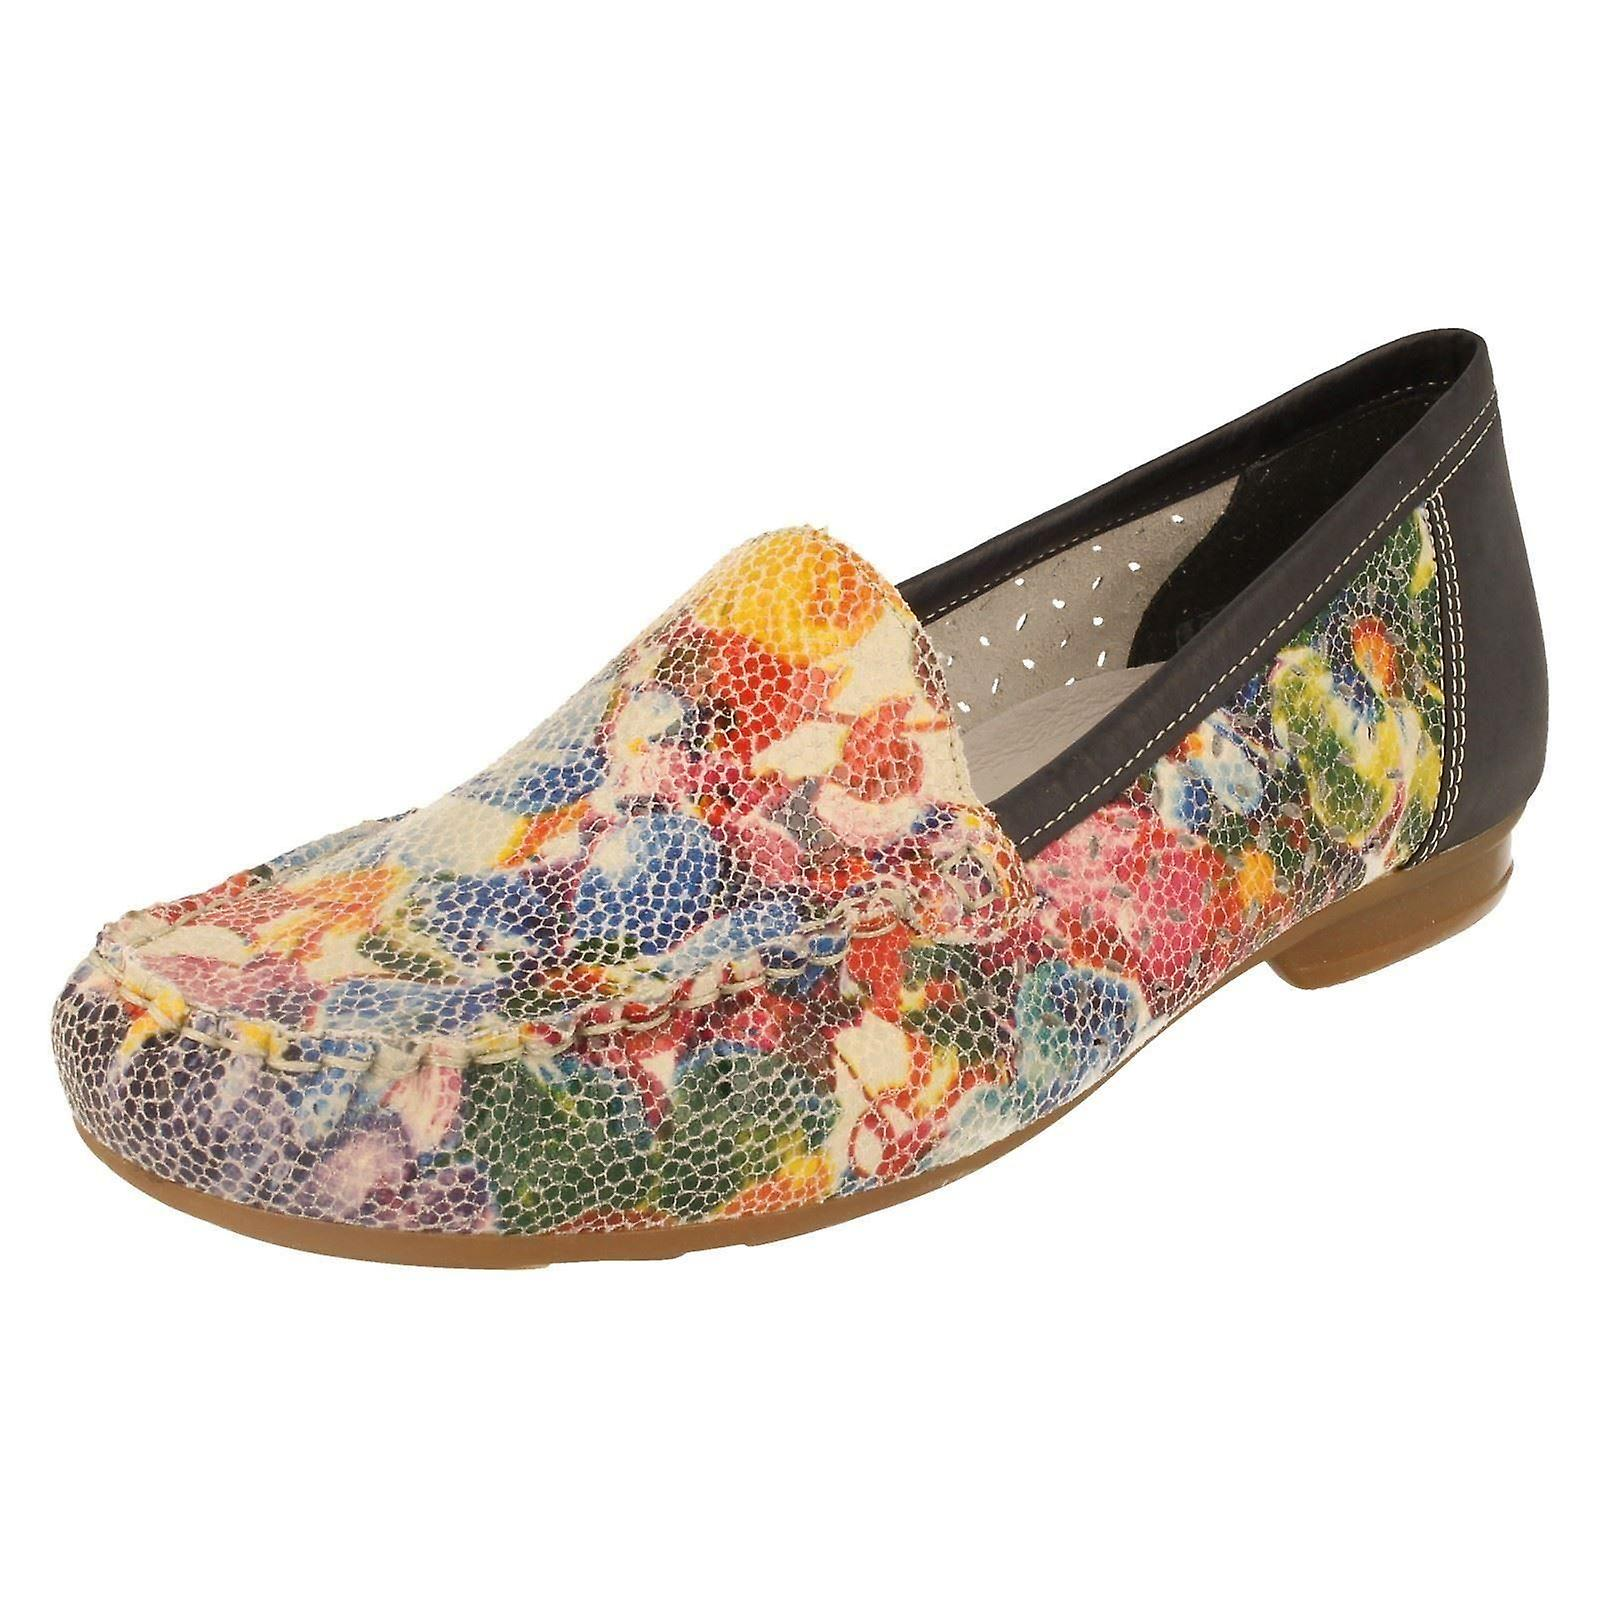 Rieker Rieker 40089 Shoes Shoes Rieker ladies ladies 40089 ladies Shoes 40089 ladies Shoes Rieker RwPdqAT